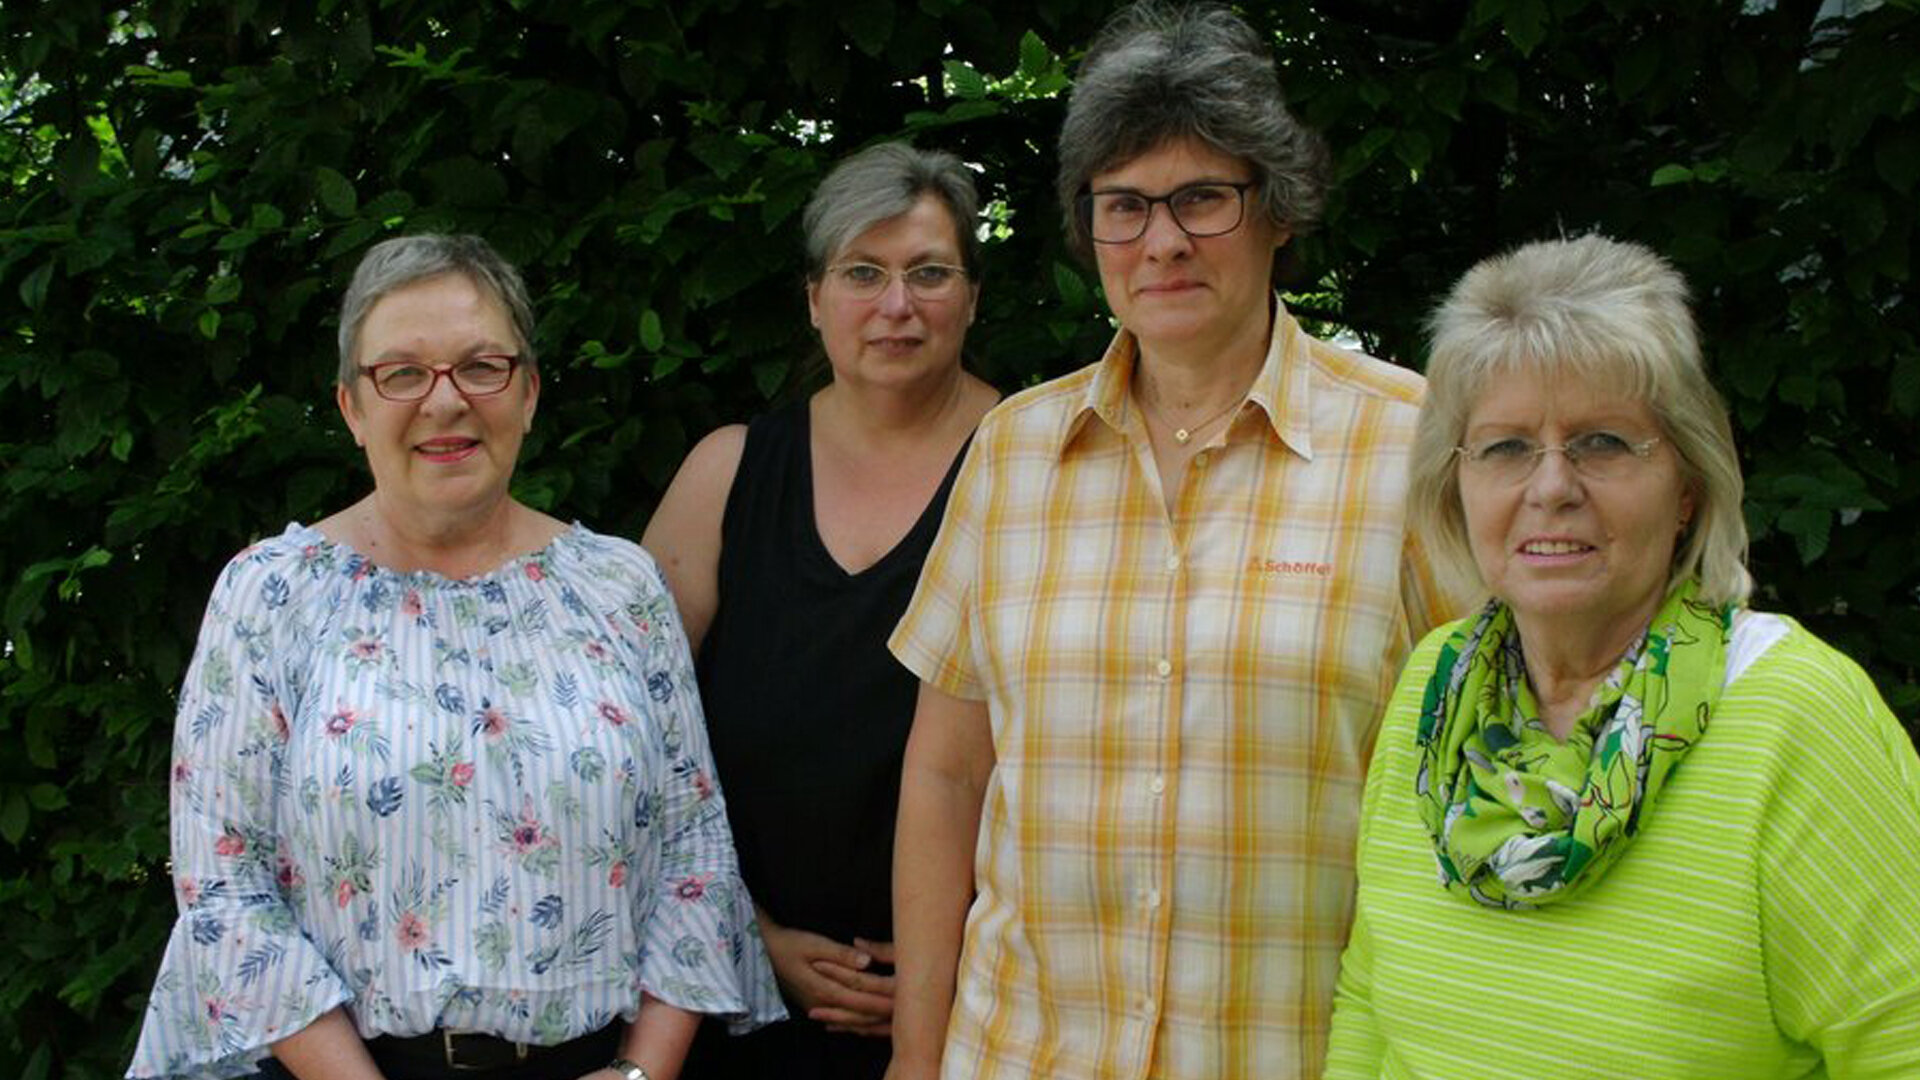 Von links: Waltraut Heus/Beratungsstelle Winsen (Luhe), Brigitte Thiele/Delegierte, Anja Schulz/Delegierte, Alexandra Marnetté/Kontaktgruppenleitung